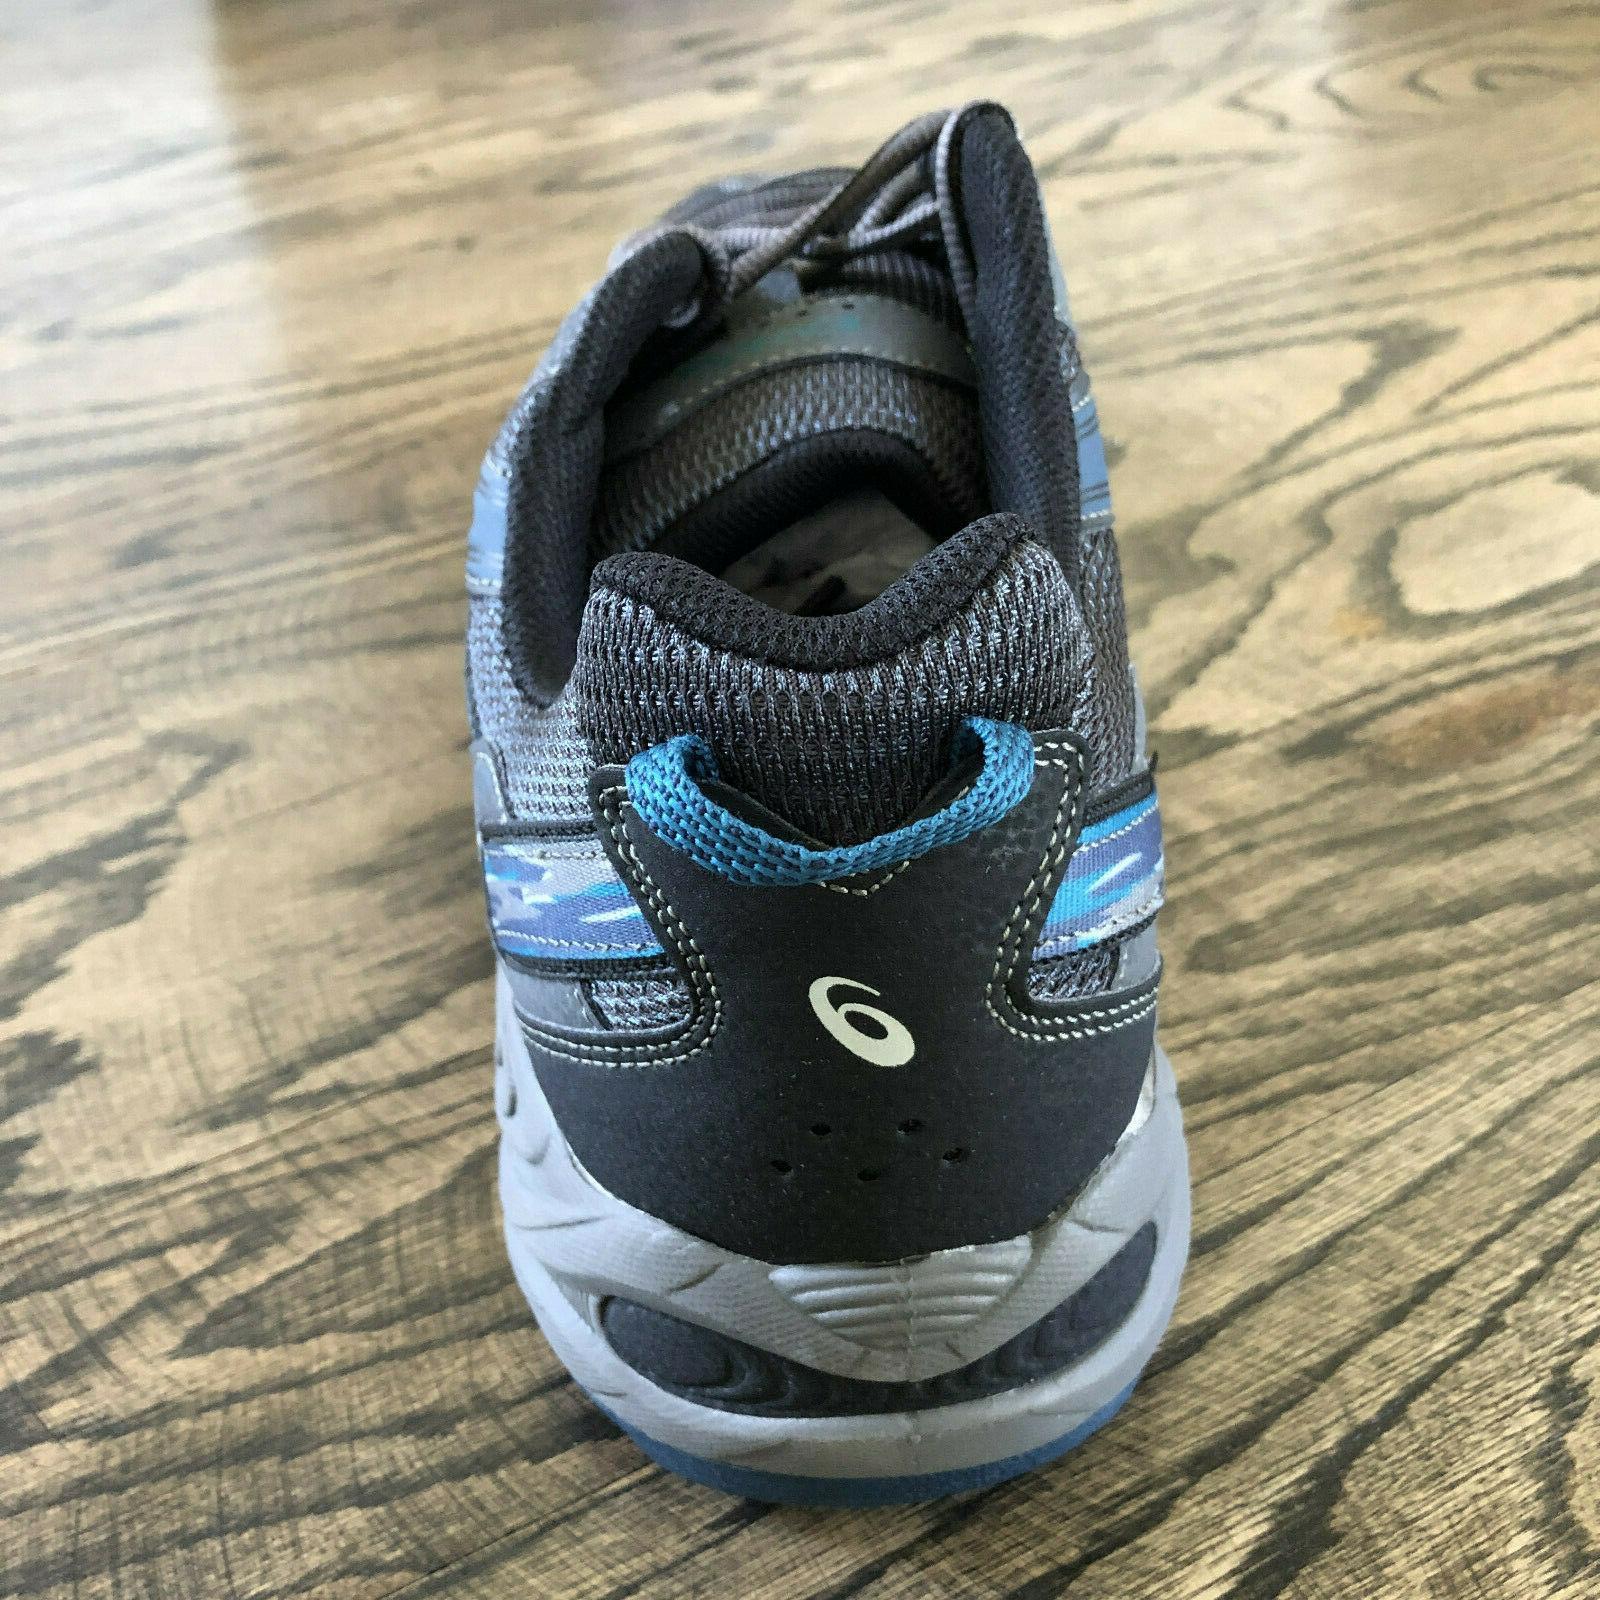 ASICS 5 Running Shoe Size